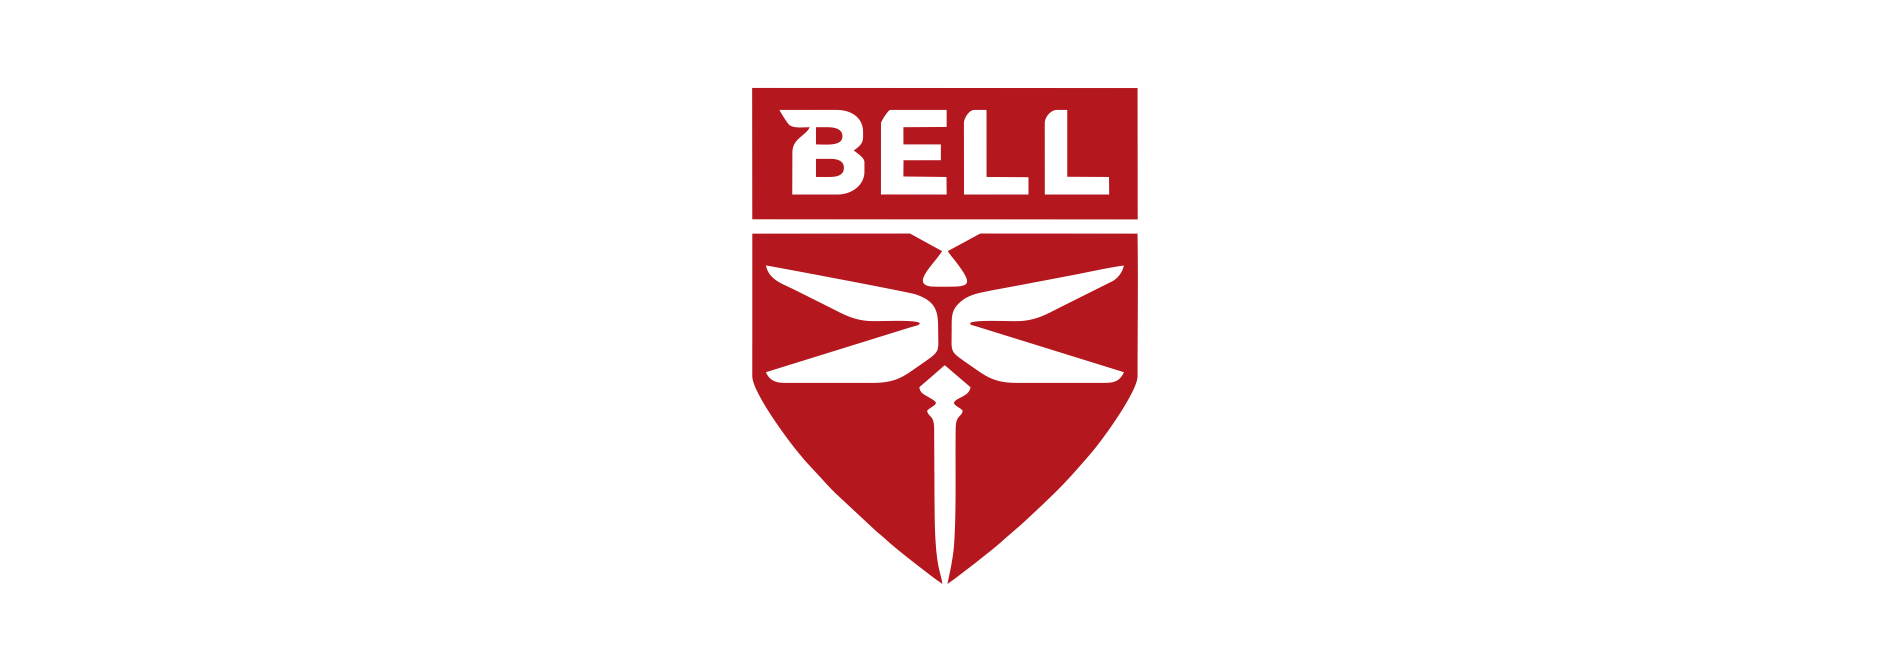 https://www.abraphe.org.br/wp-content/uploads/2018/05/bell_novo.png